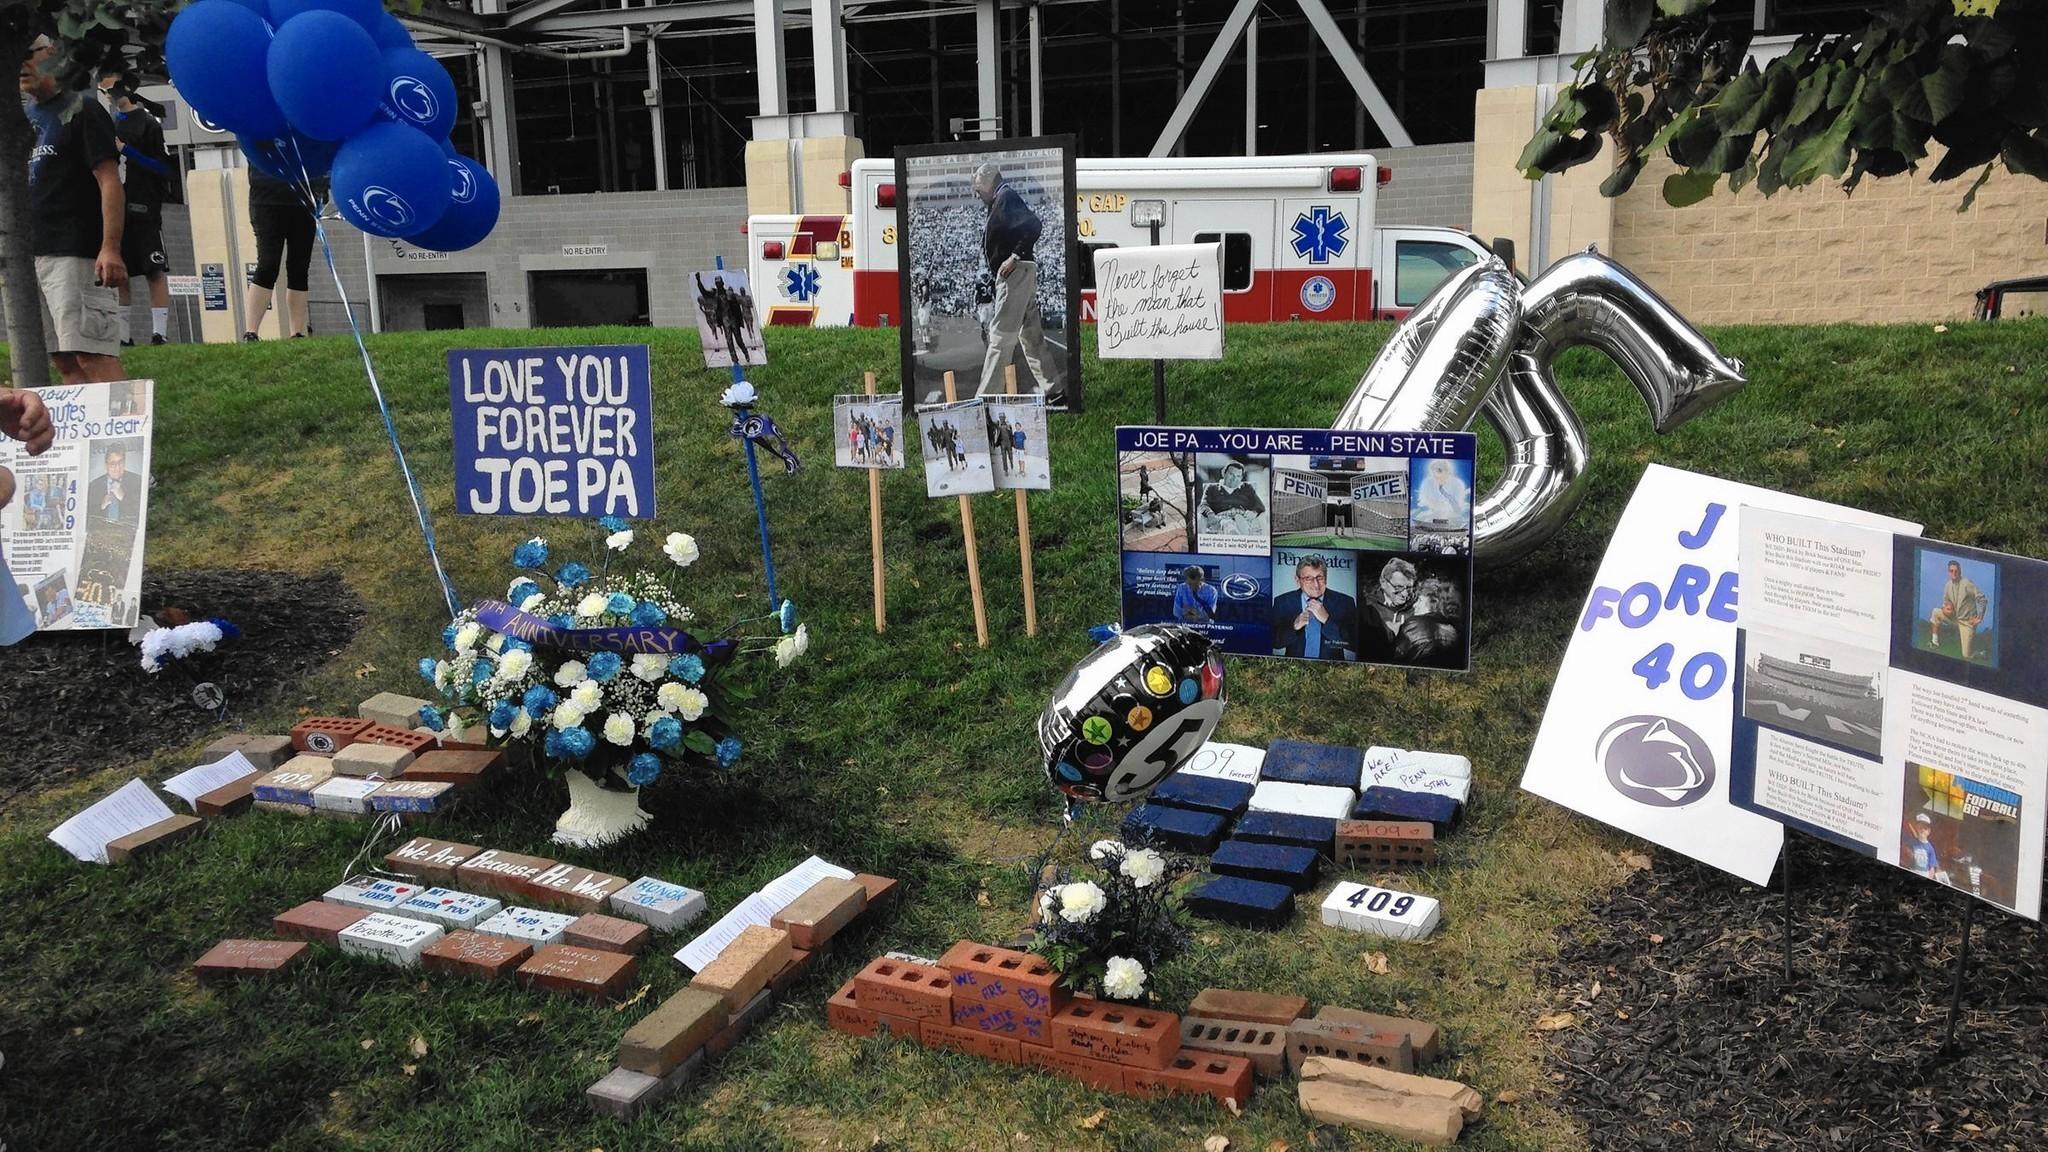 Crowd cheers Joe Paterno commemoration at Beaver Stadium – The Morning Call